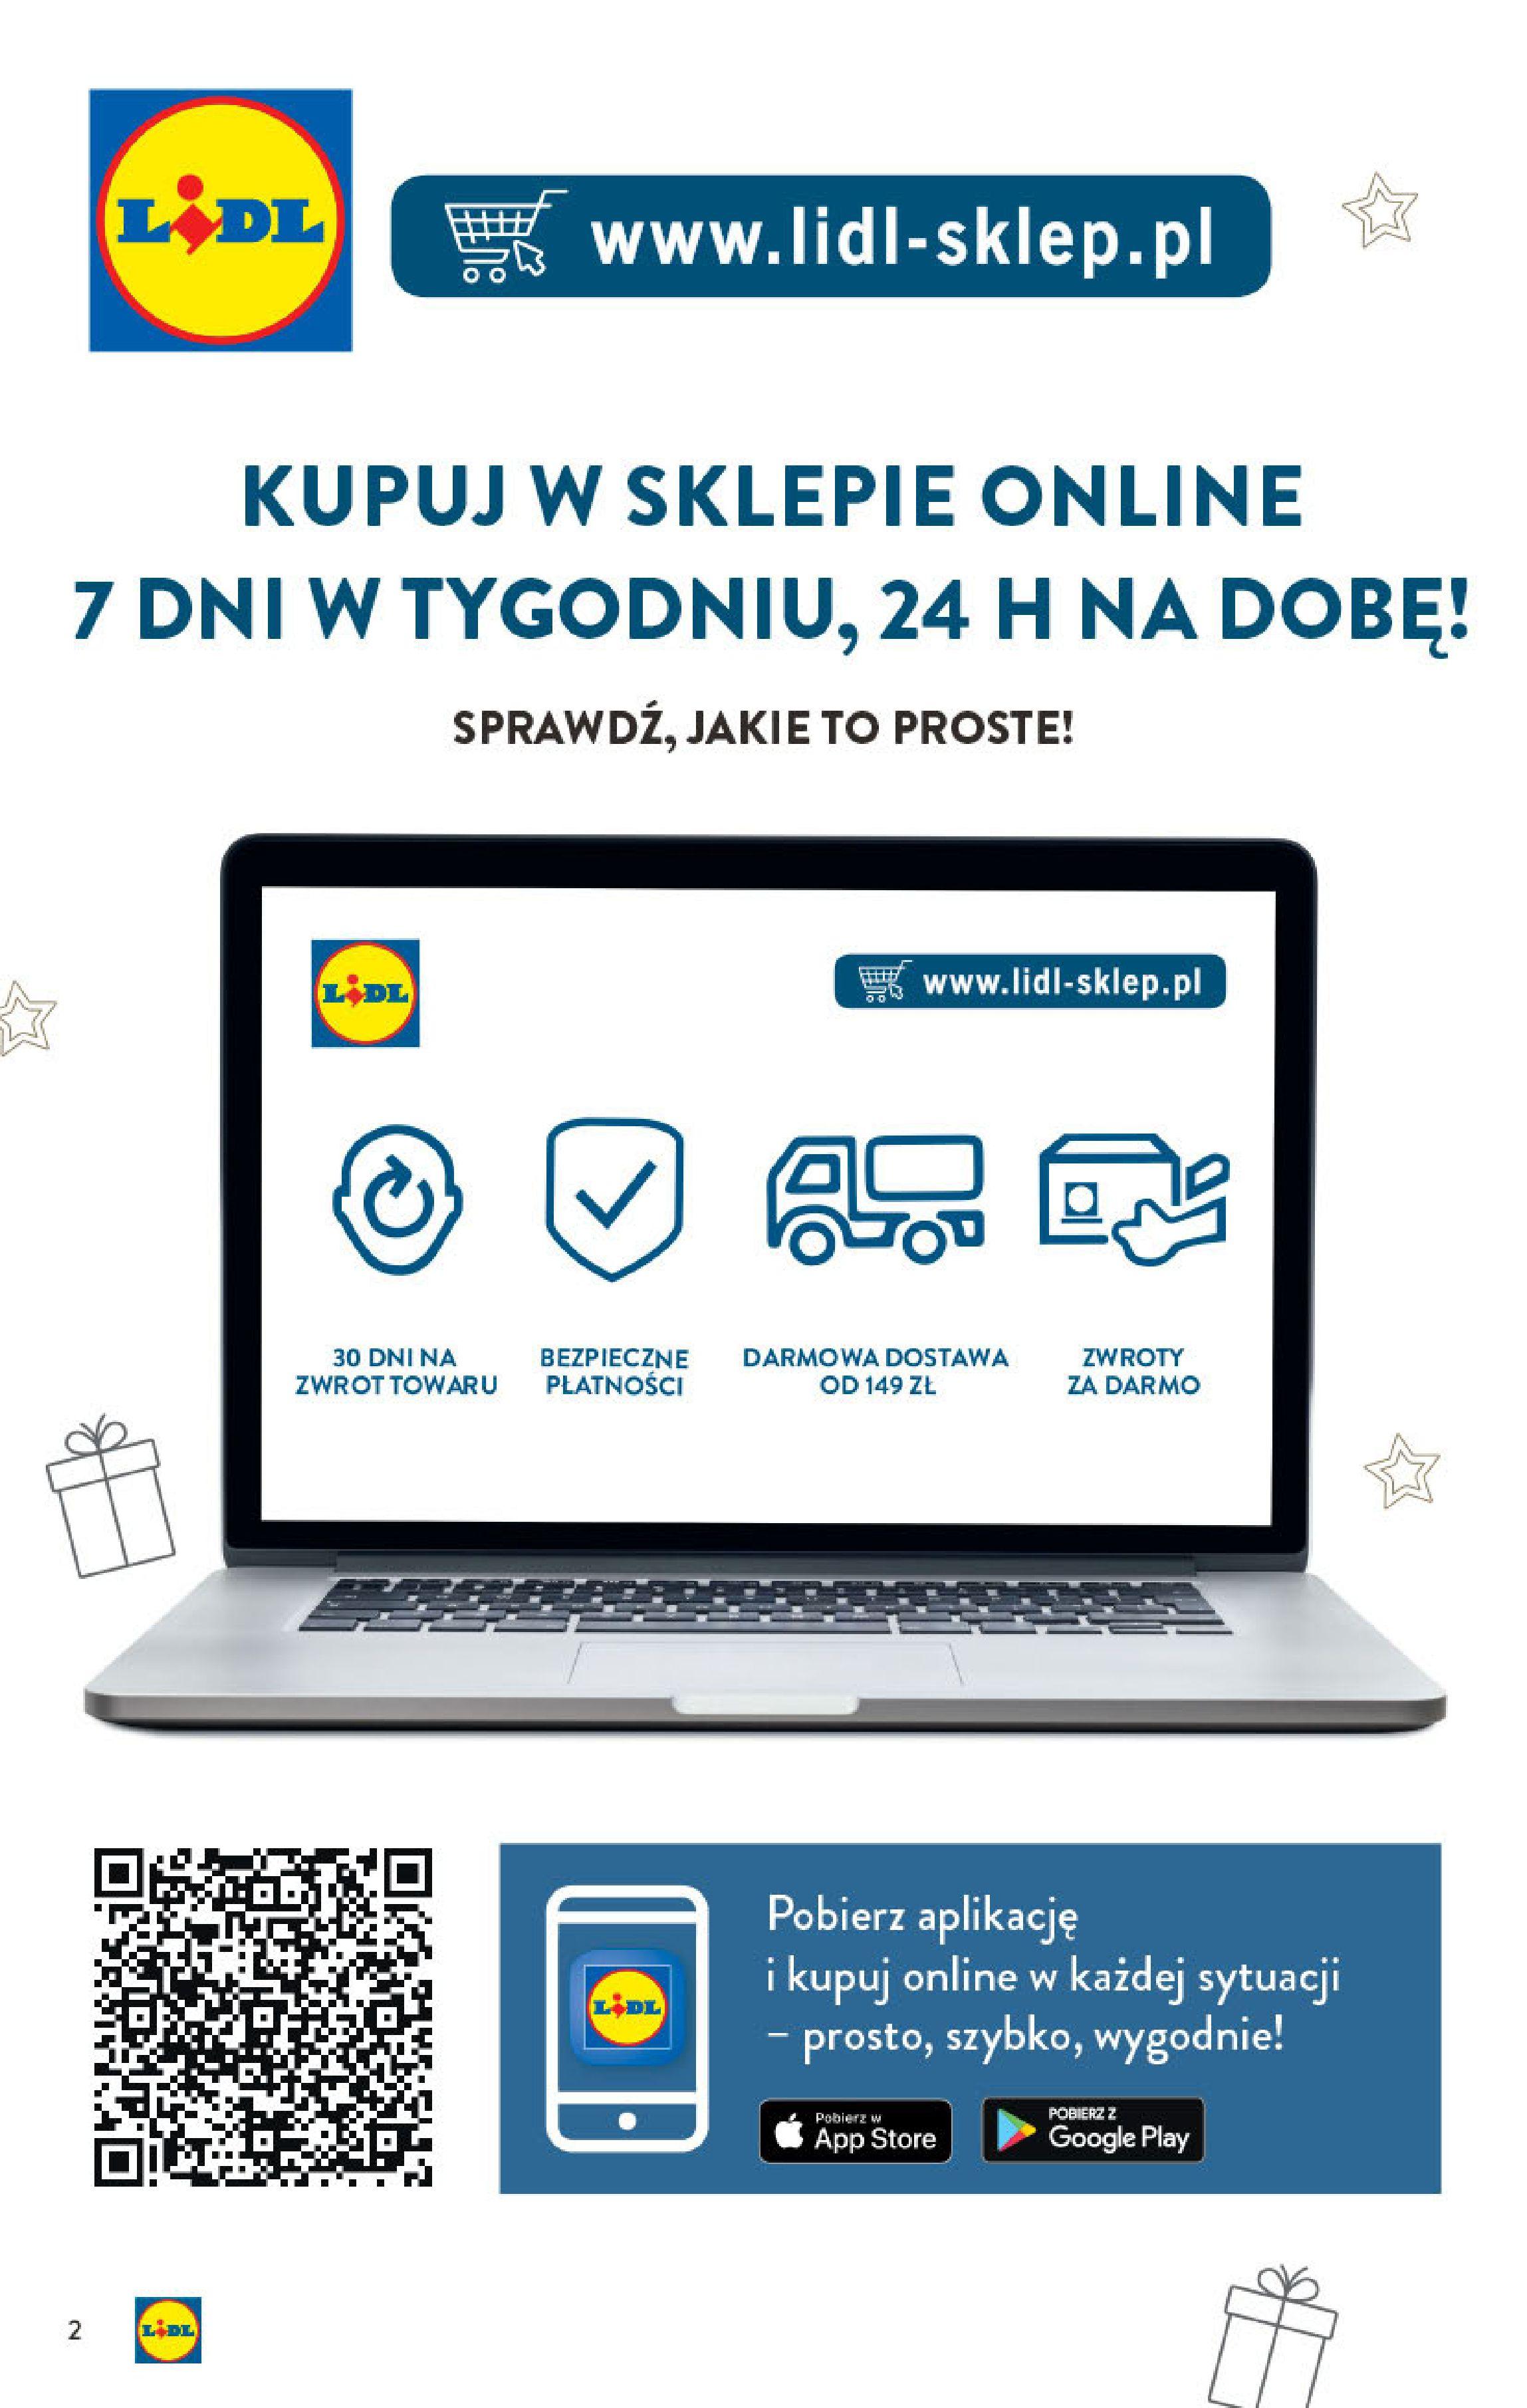 Gazetka Lidl - Katalog Online-13.10.2019-02.12.2019-page-2